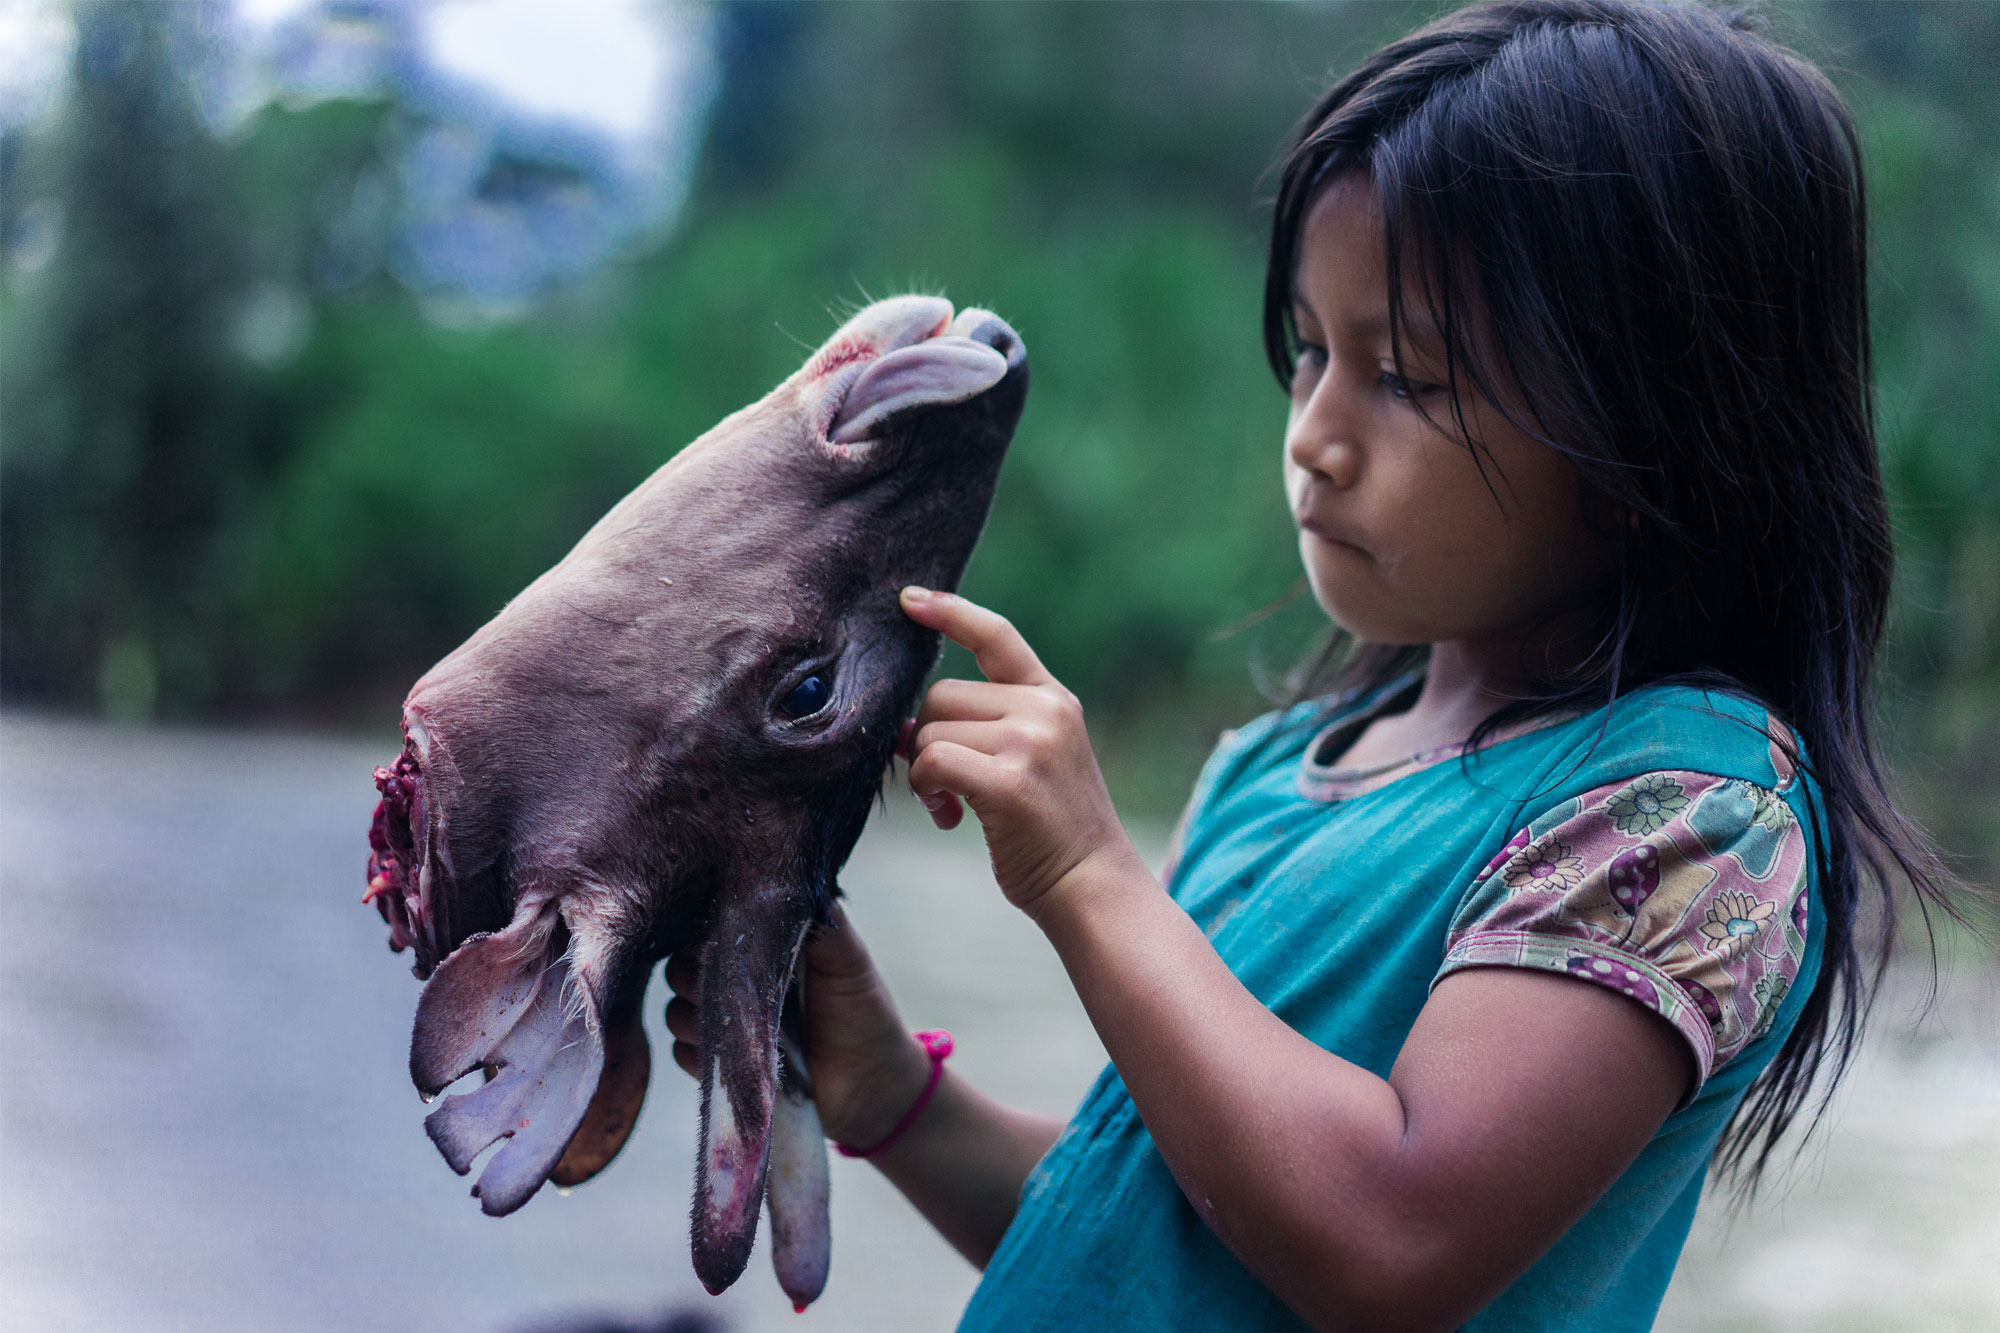 Girl holding a severed deer's head